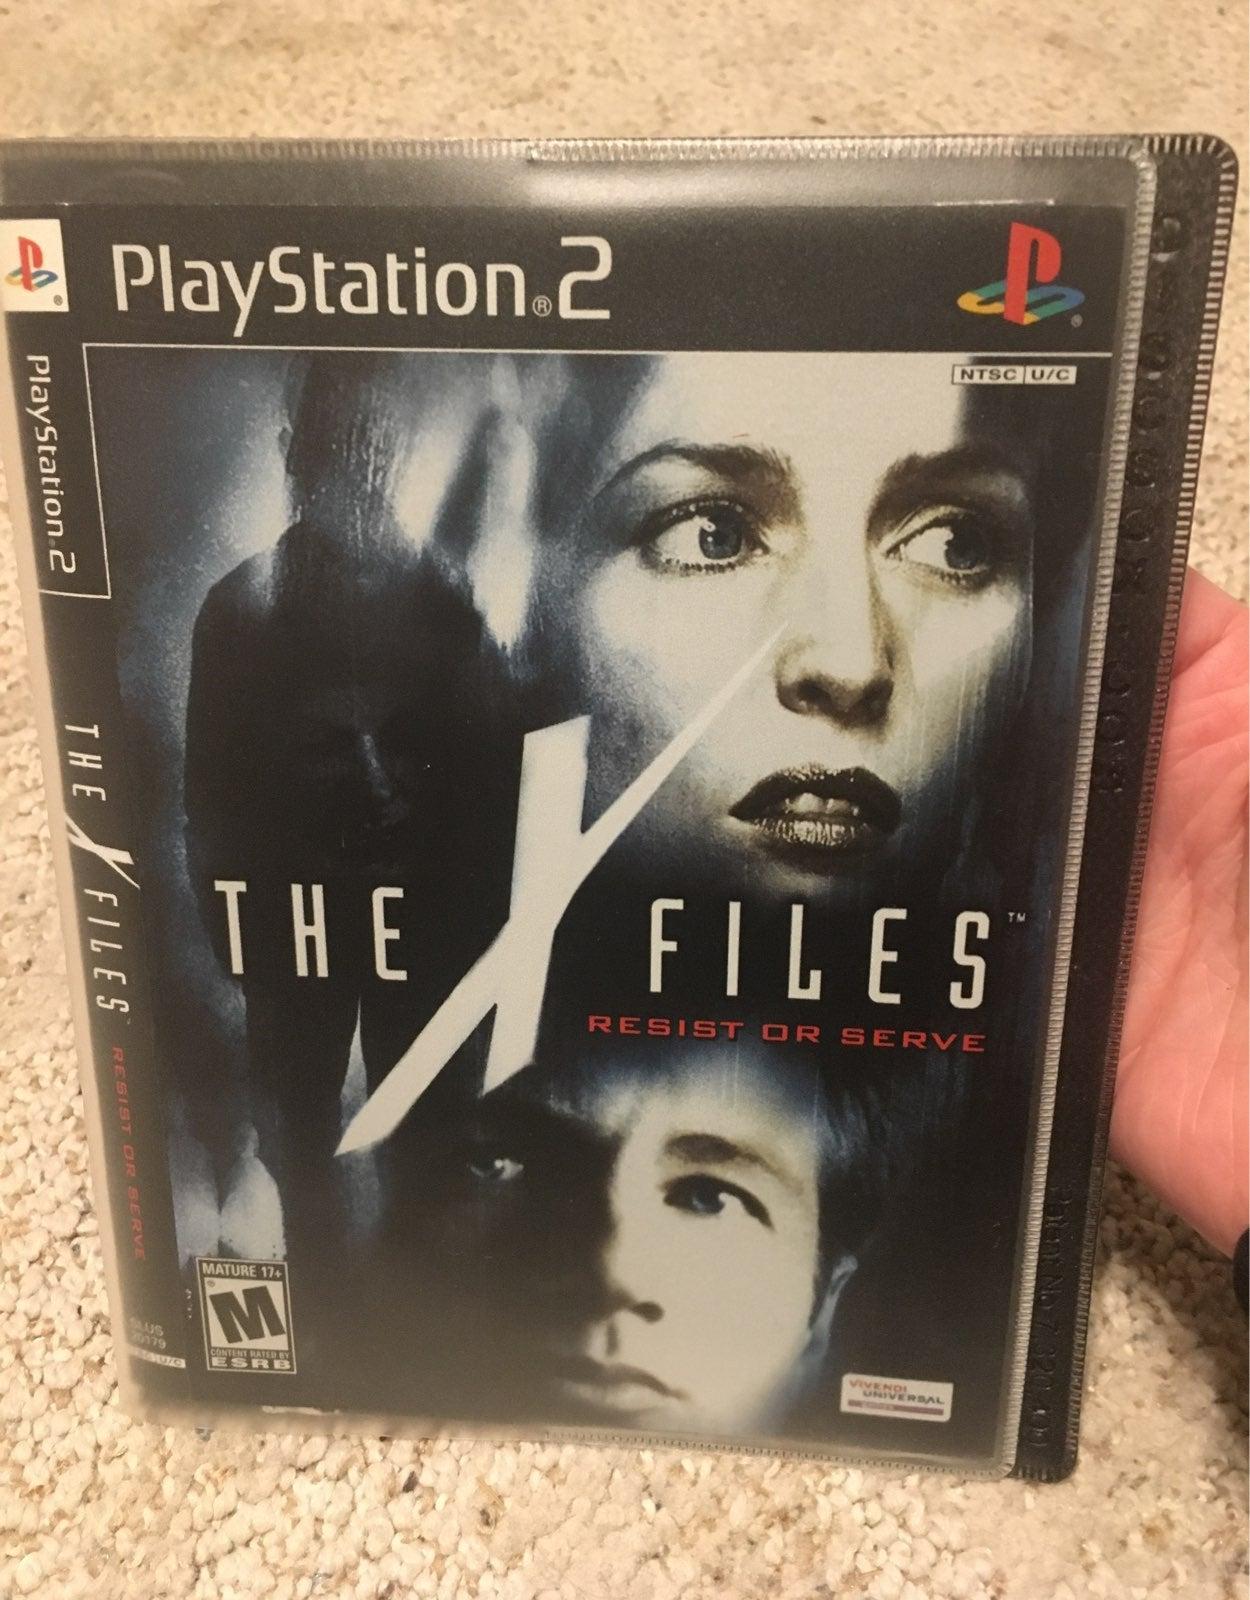 X-Files resist or serve ps2